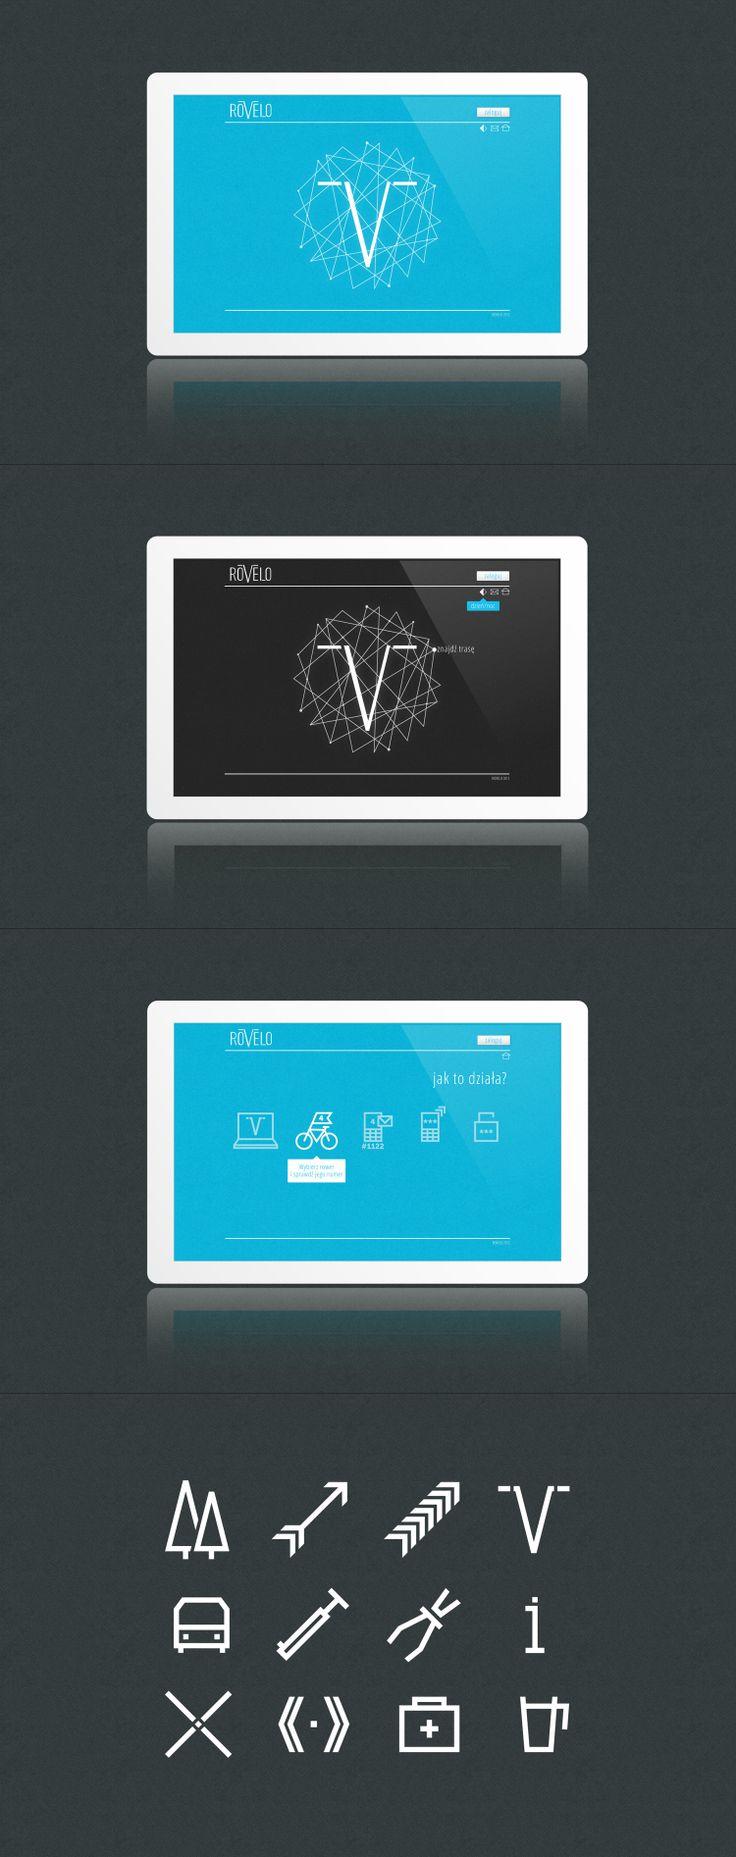 Rovelo #interface #design #UI #website #web #pleo